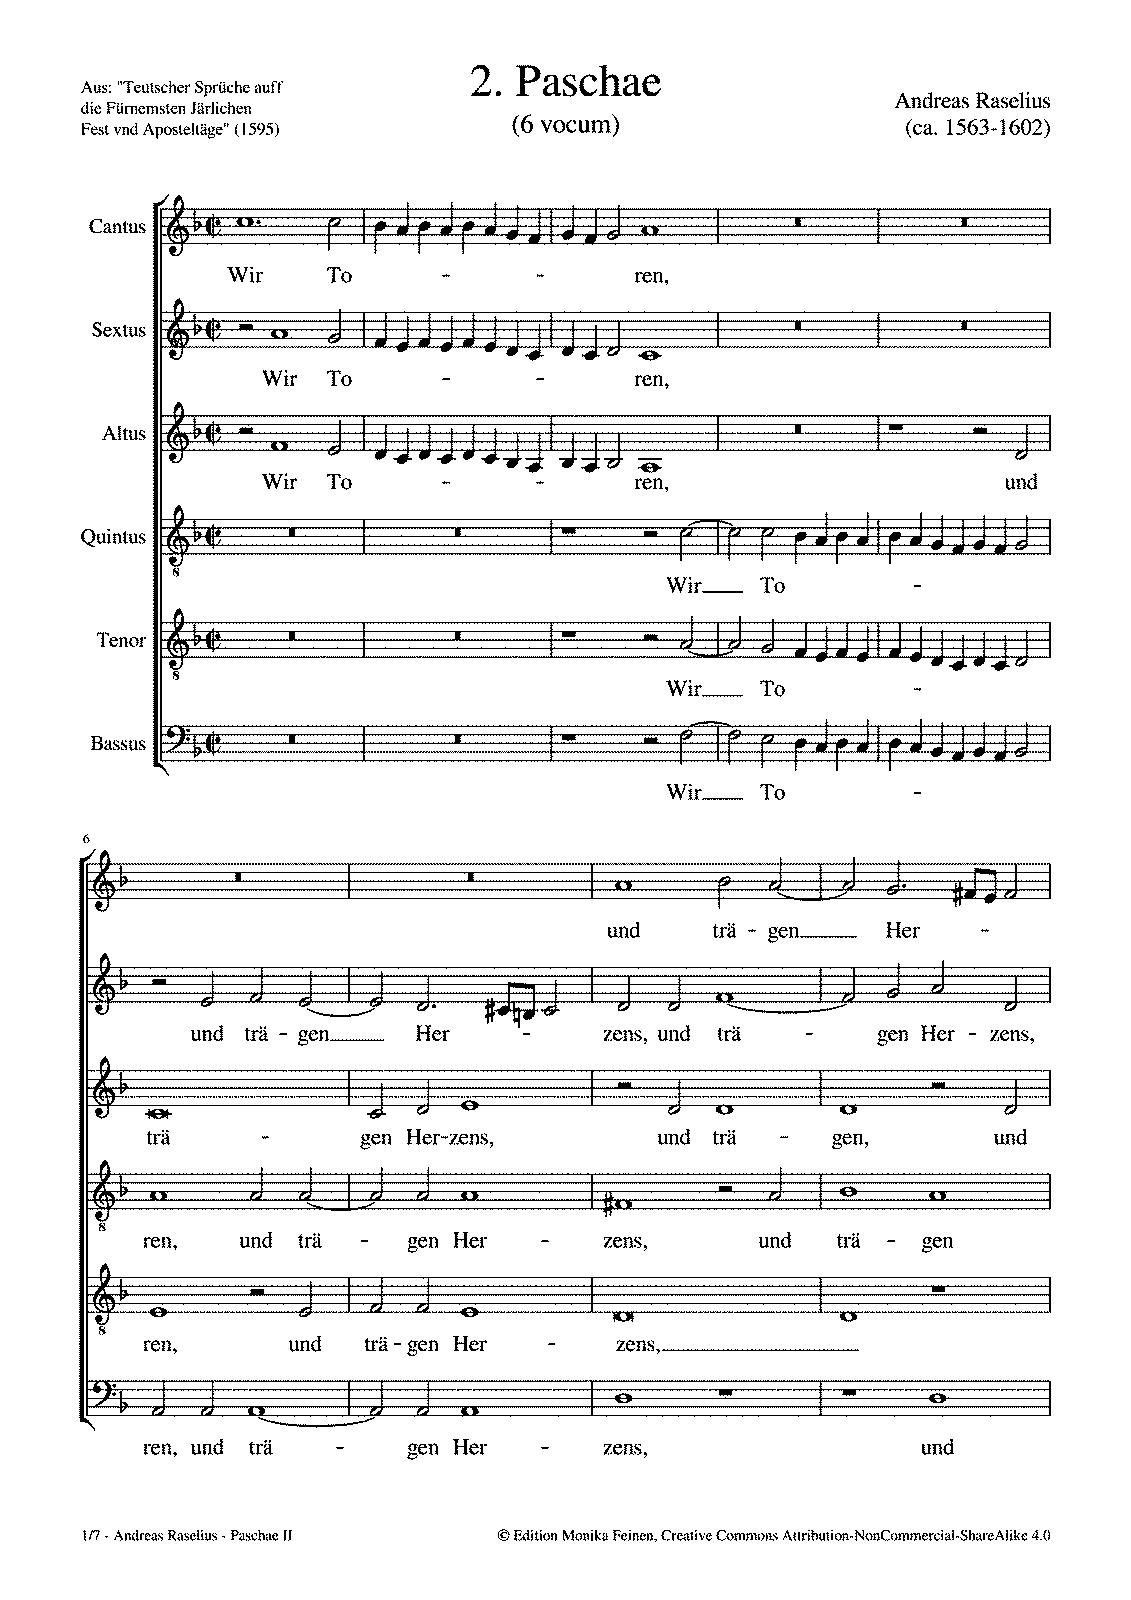 2  Paschae (Raselius, Andreas) - IMSLP/Petrucci Music